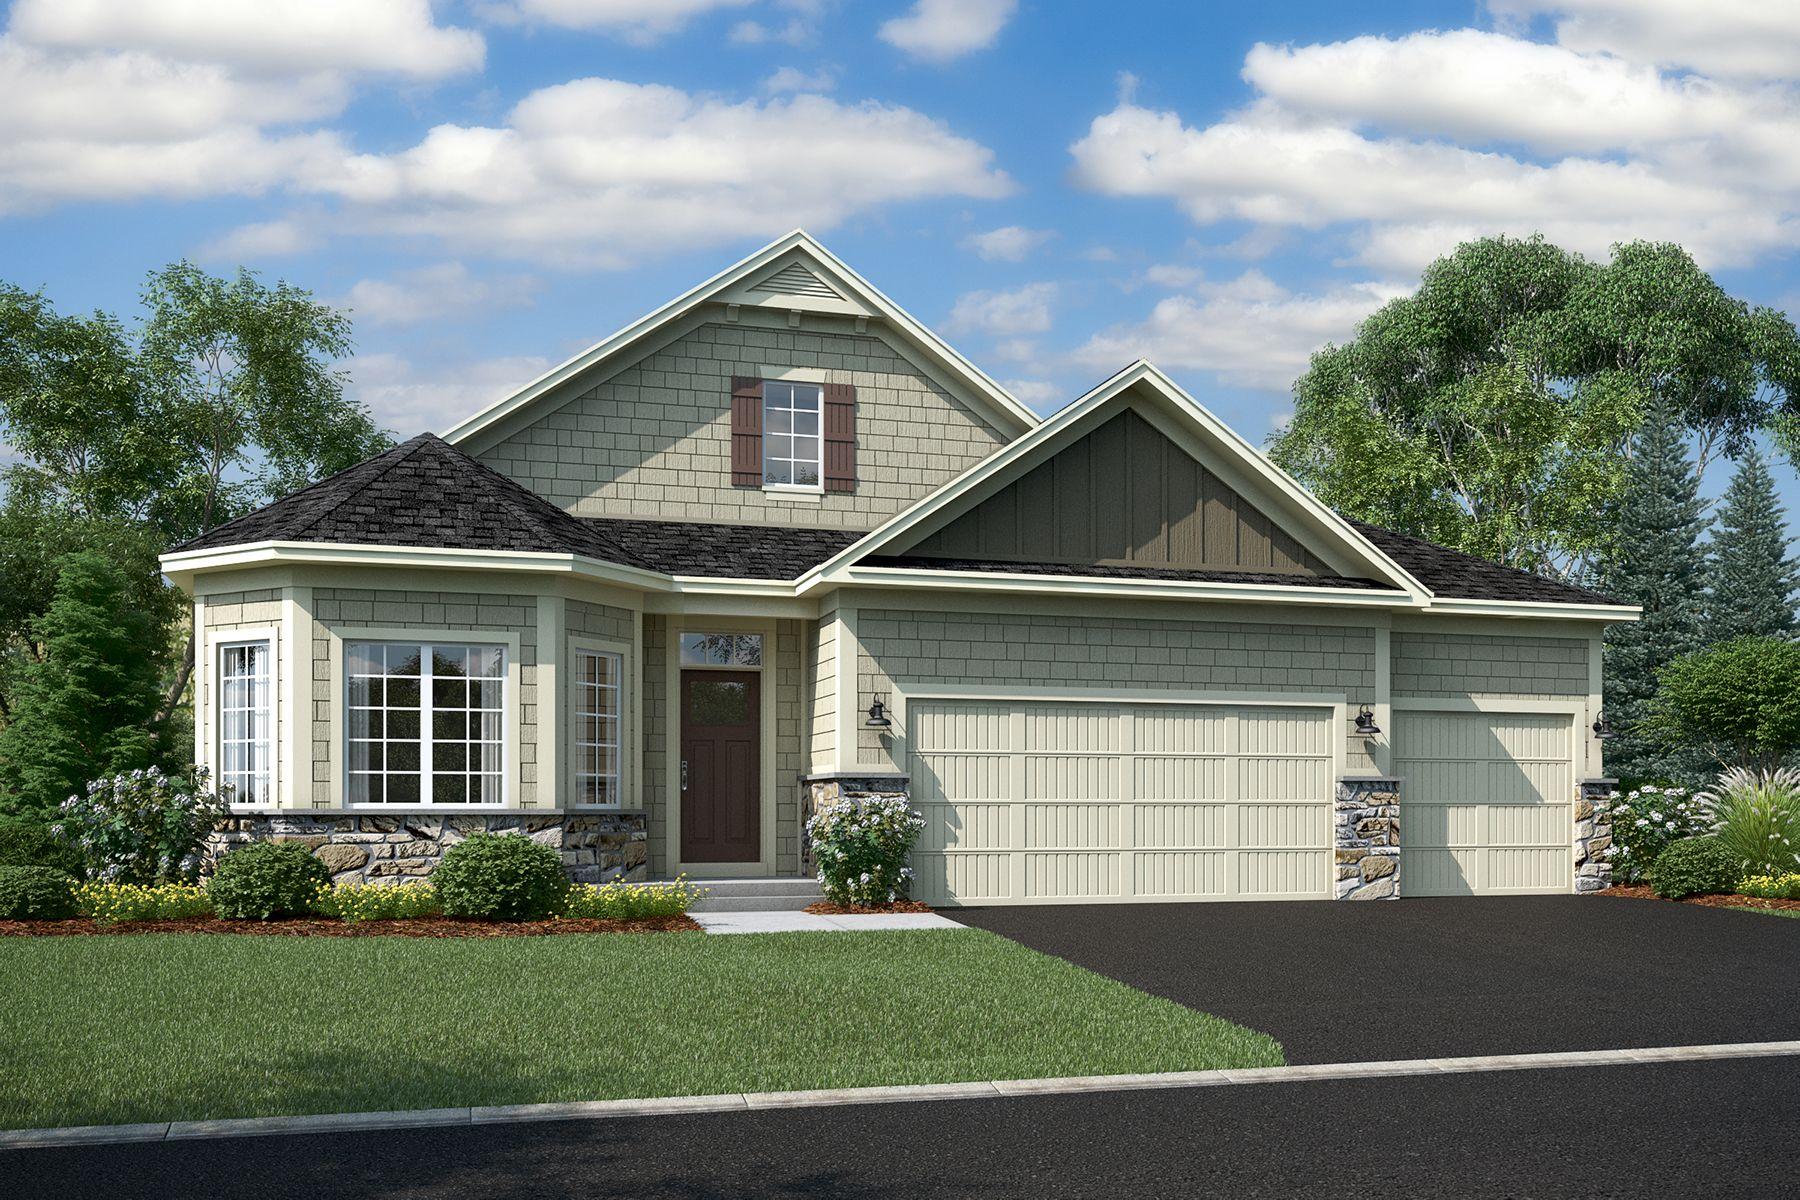 单亲家庭 为 销售 在 Graystone 4271 Lotus Drive Minnetrista, Minnesota 55331 United States